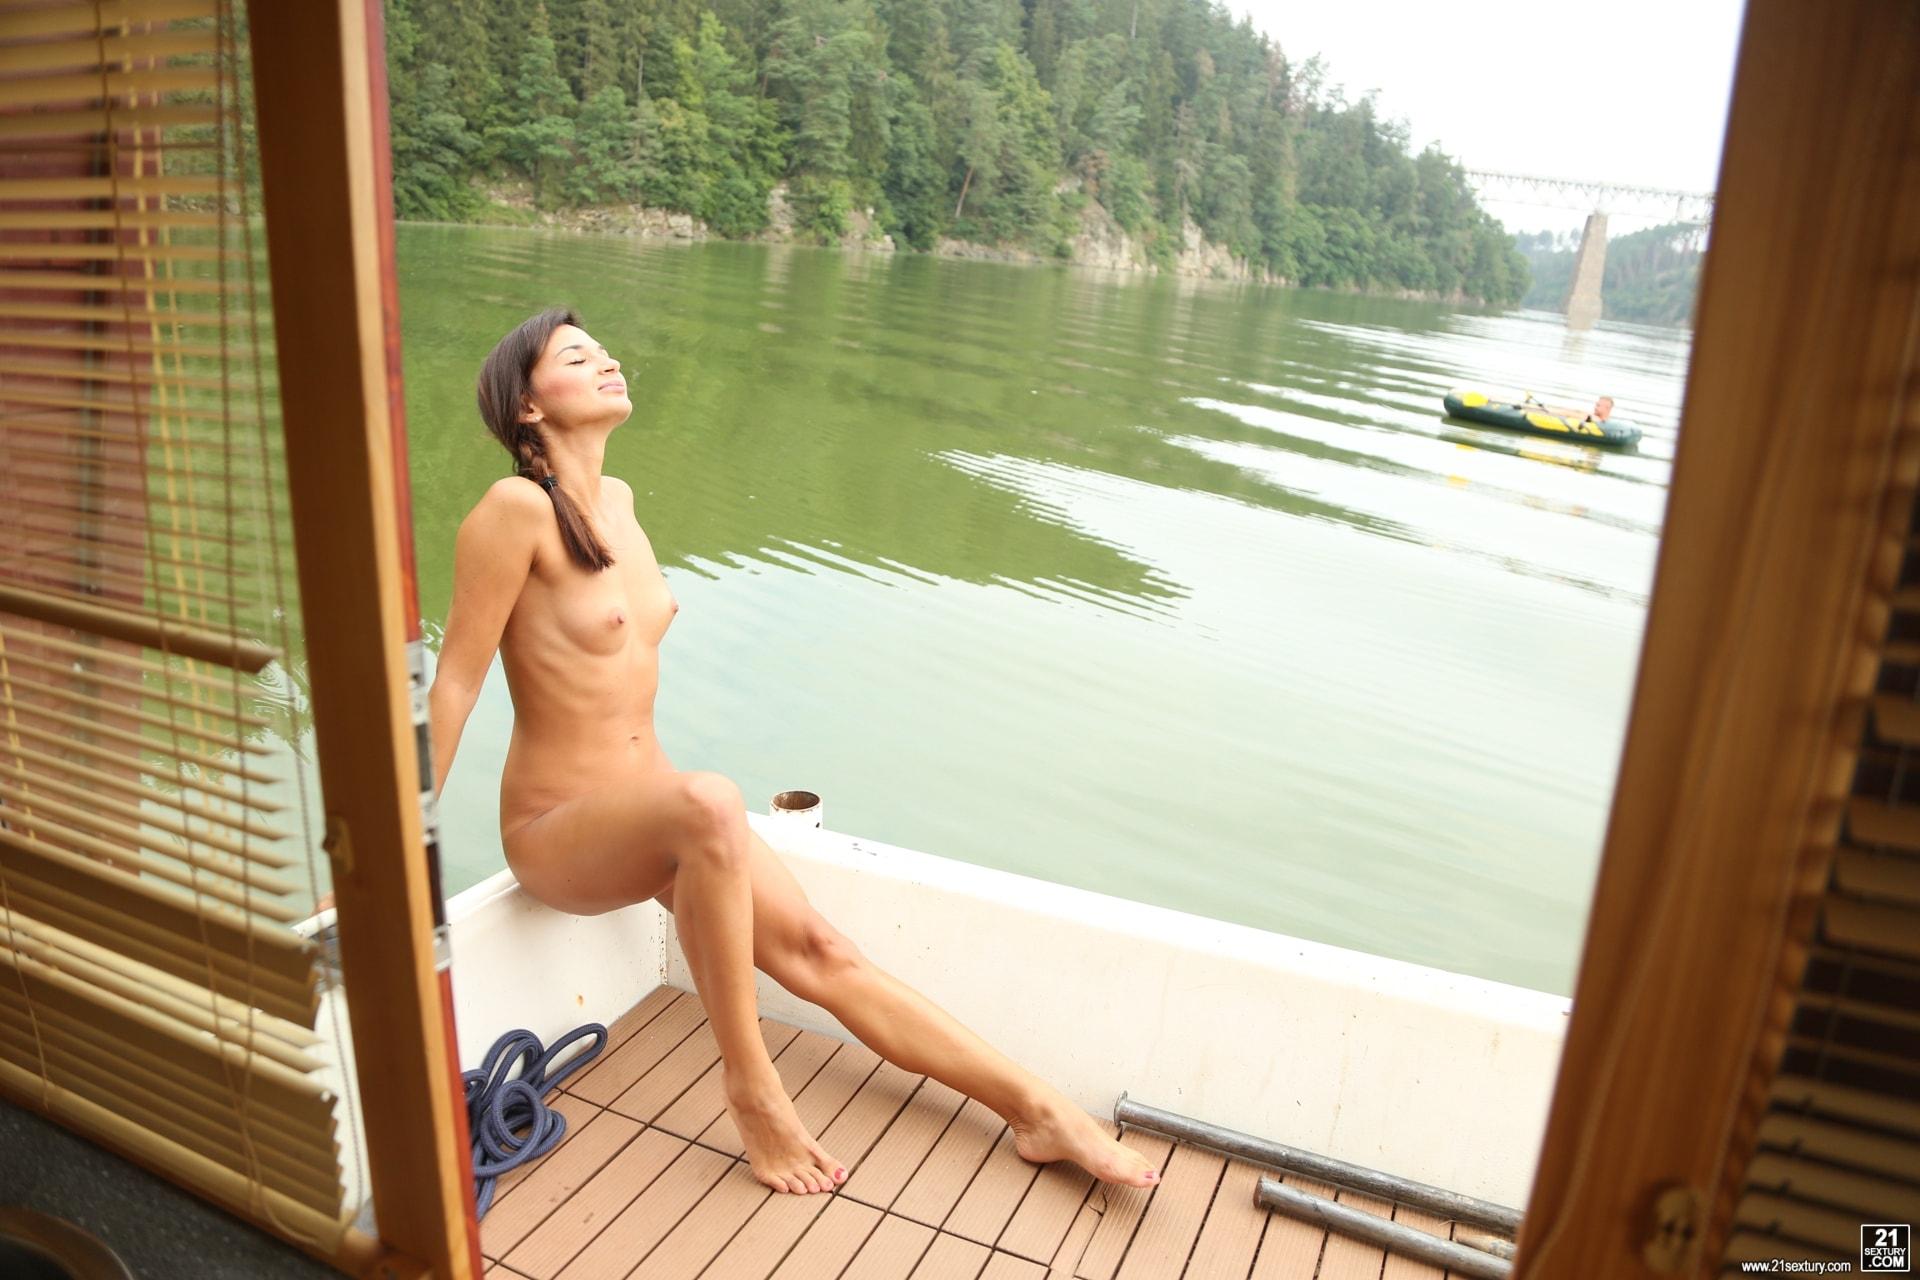 21Sextury 'No Tan Lines' starring Adela (Photo 2)